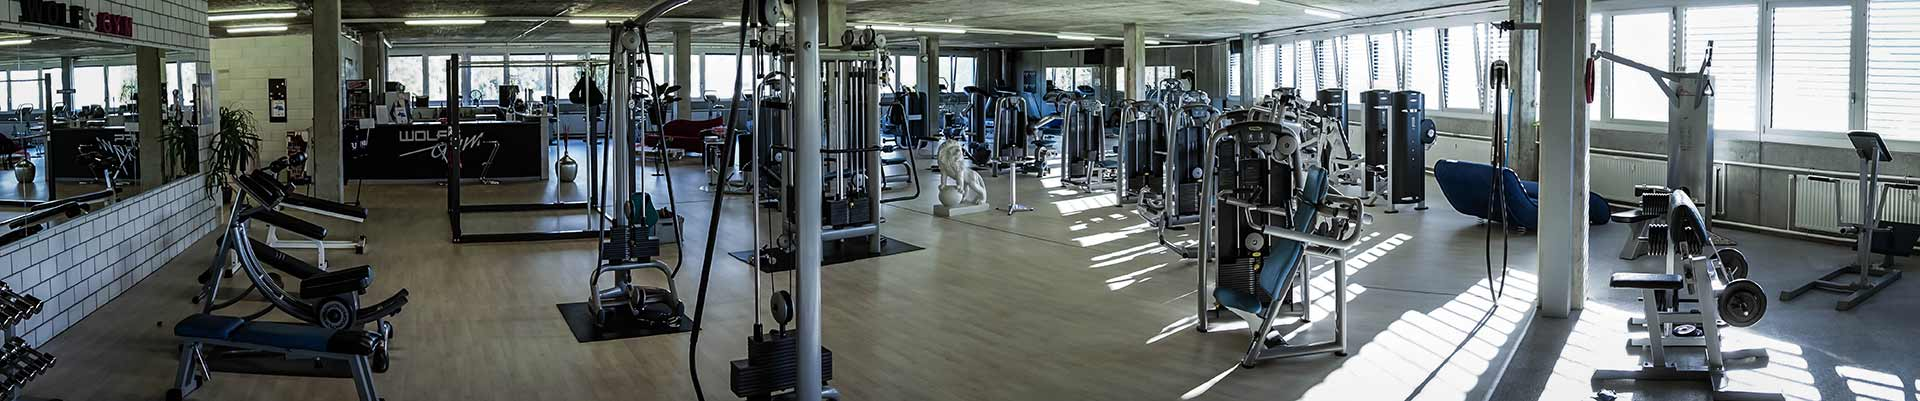 Wolfs Gym Aarberg Lyss Bern Fitness Studio